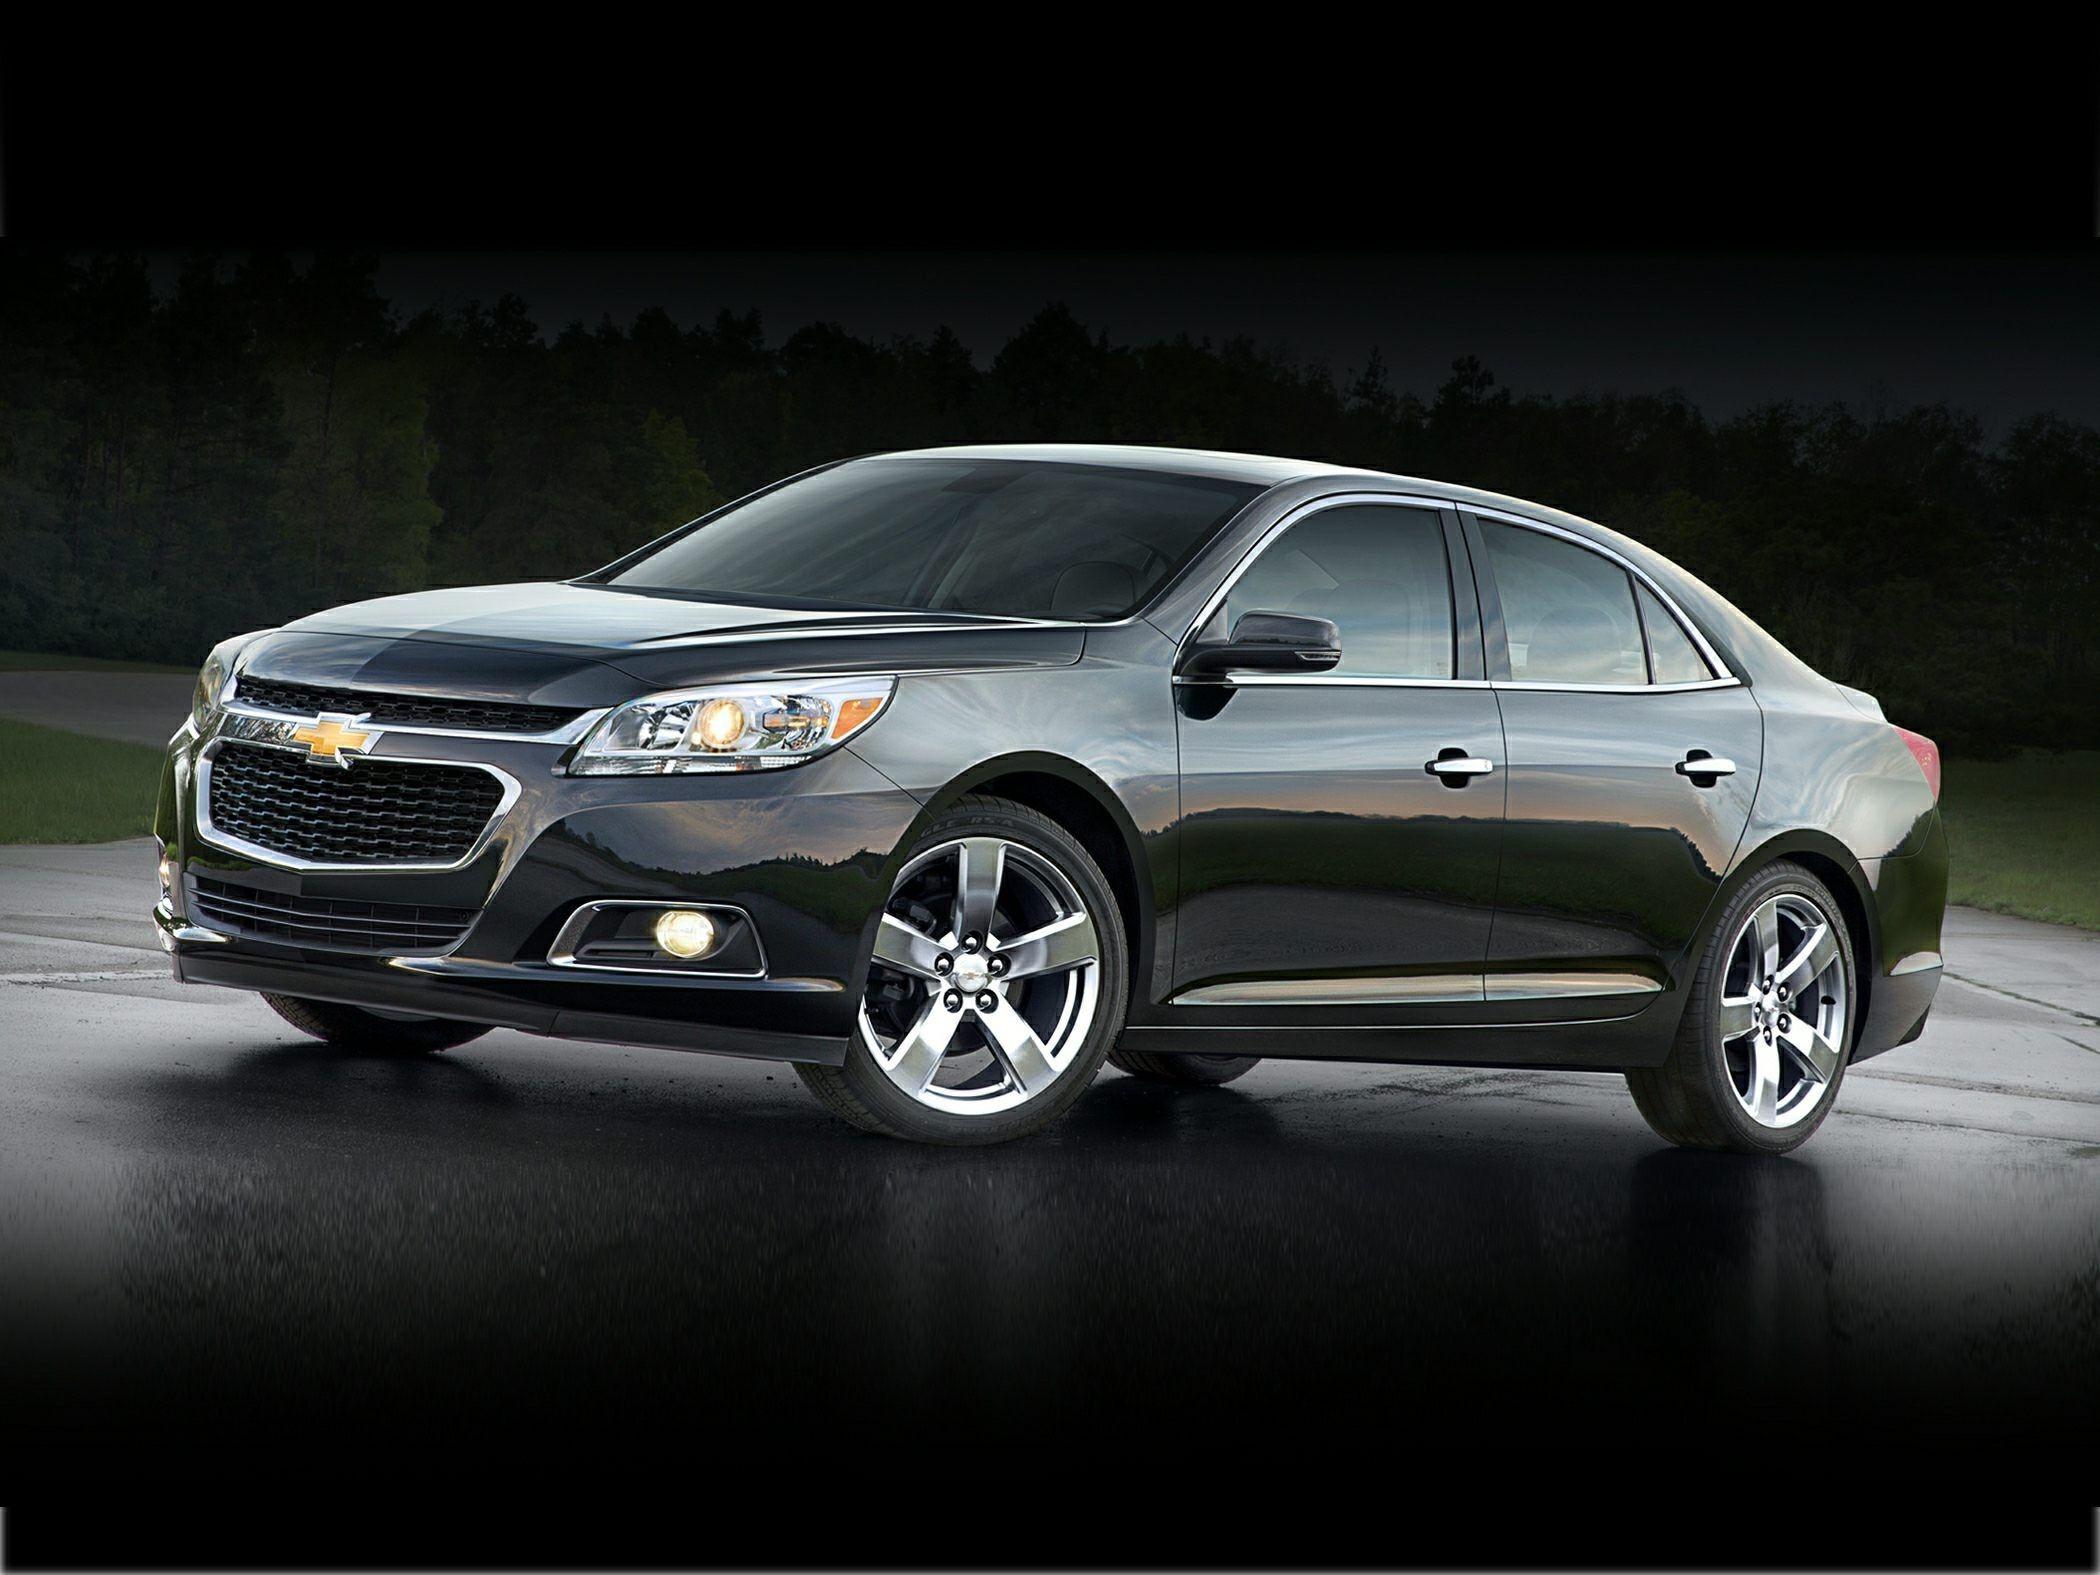 Luxury 2013 Chevy Malibu Chrome Door Trim Chevrolet Malibu